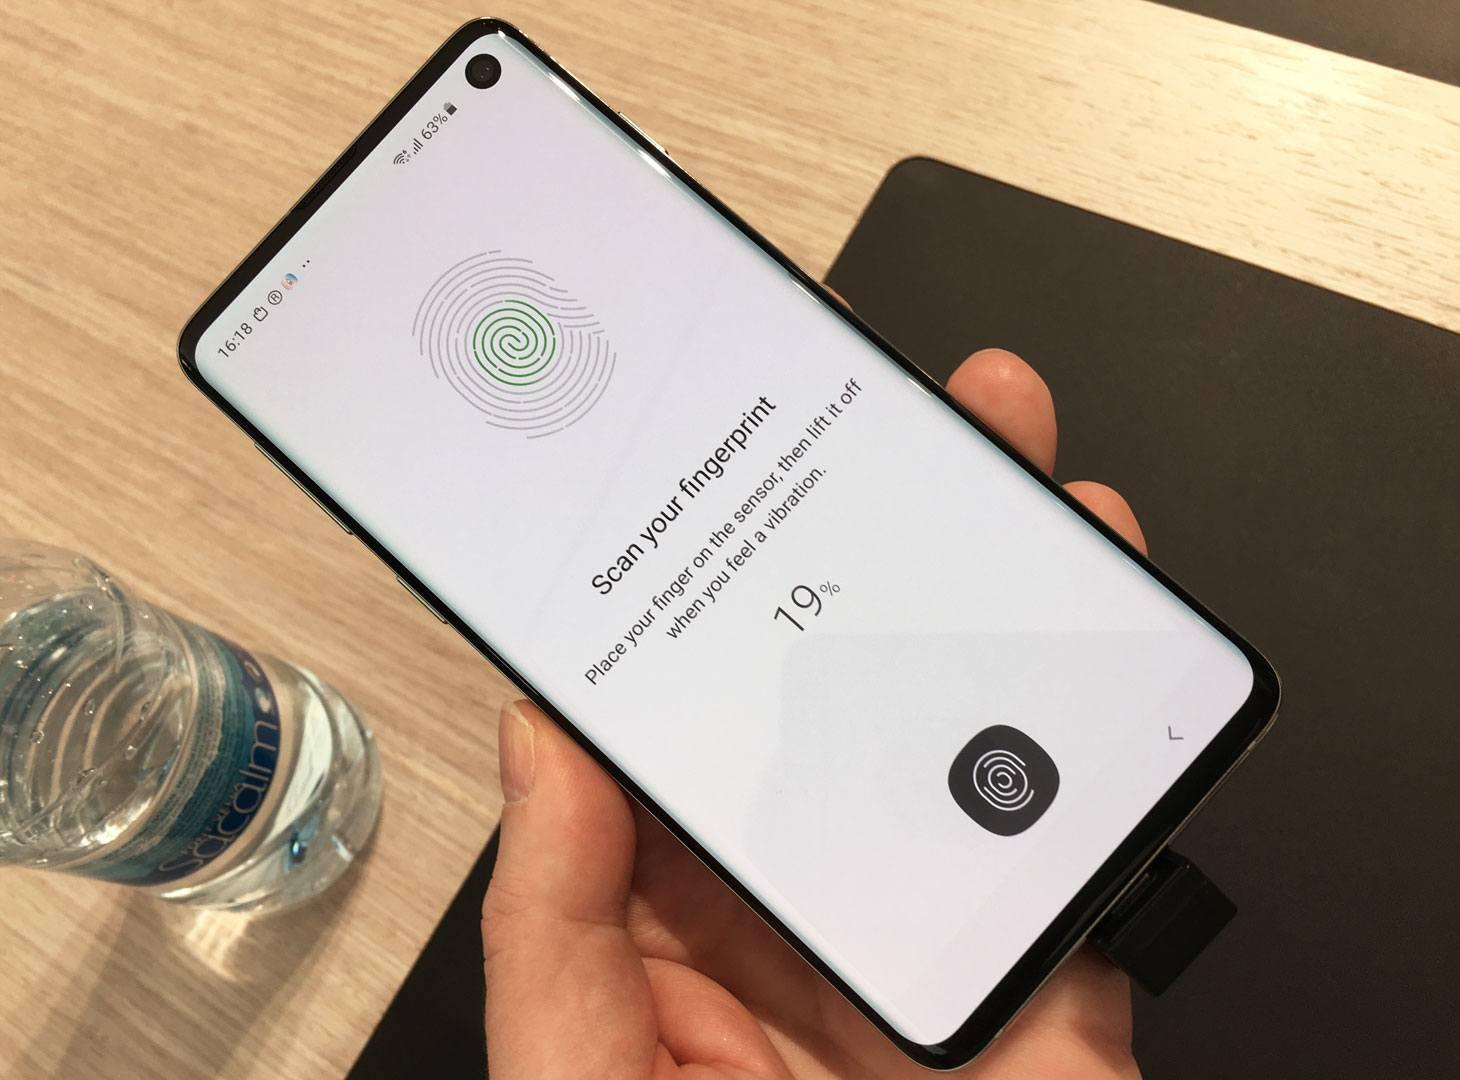 A lot of smartphones on display at MWC19 had ultrasonic fingerprint sensors